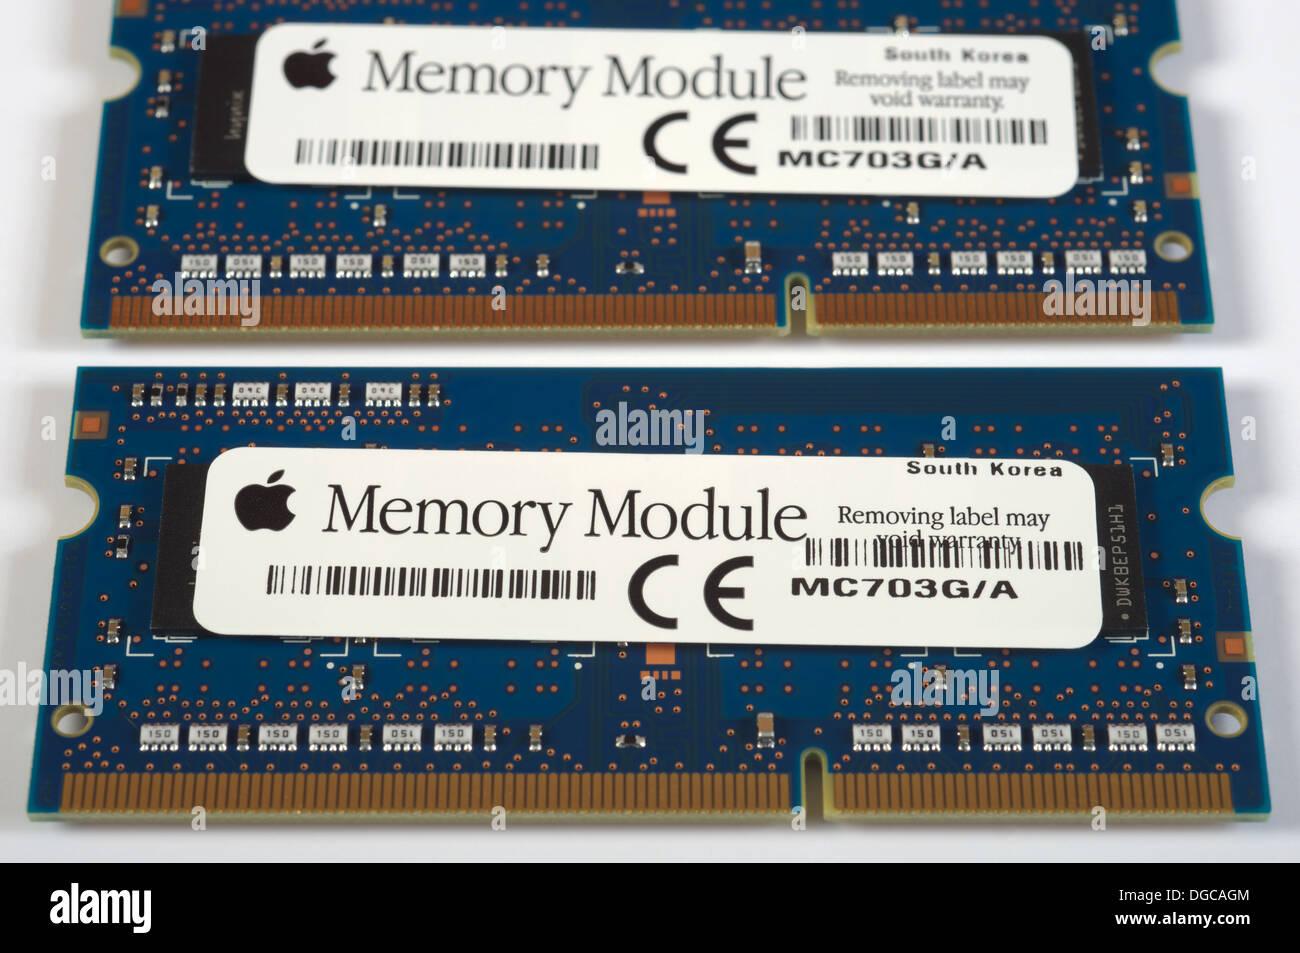 Apple computer memory modules - Stock Image